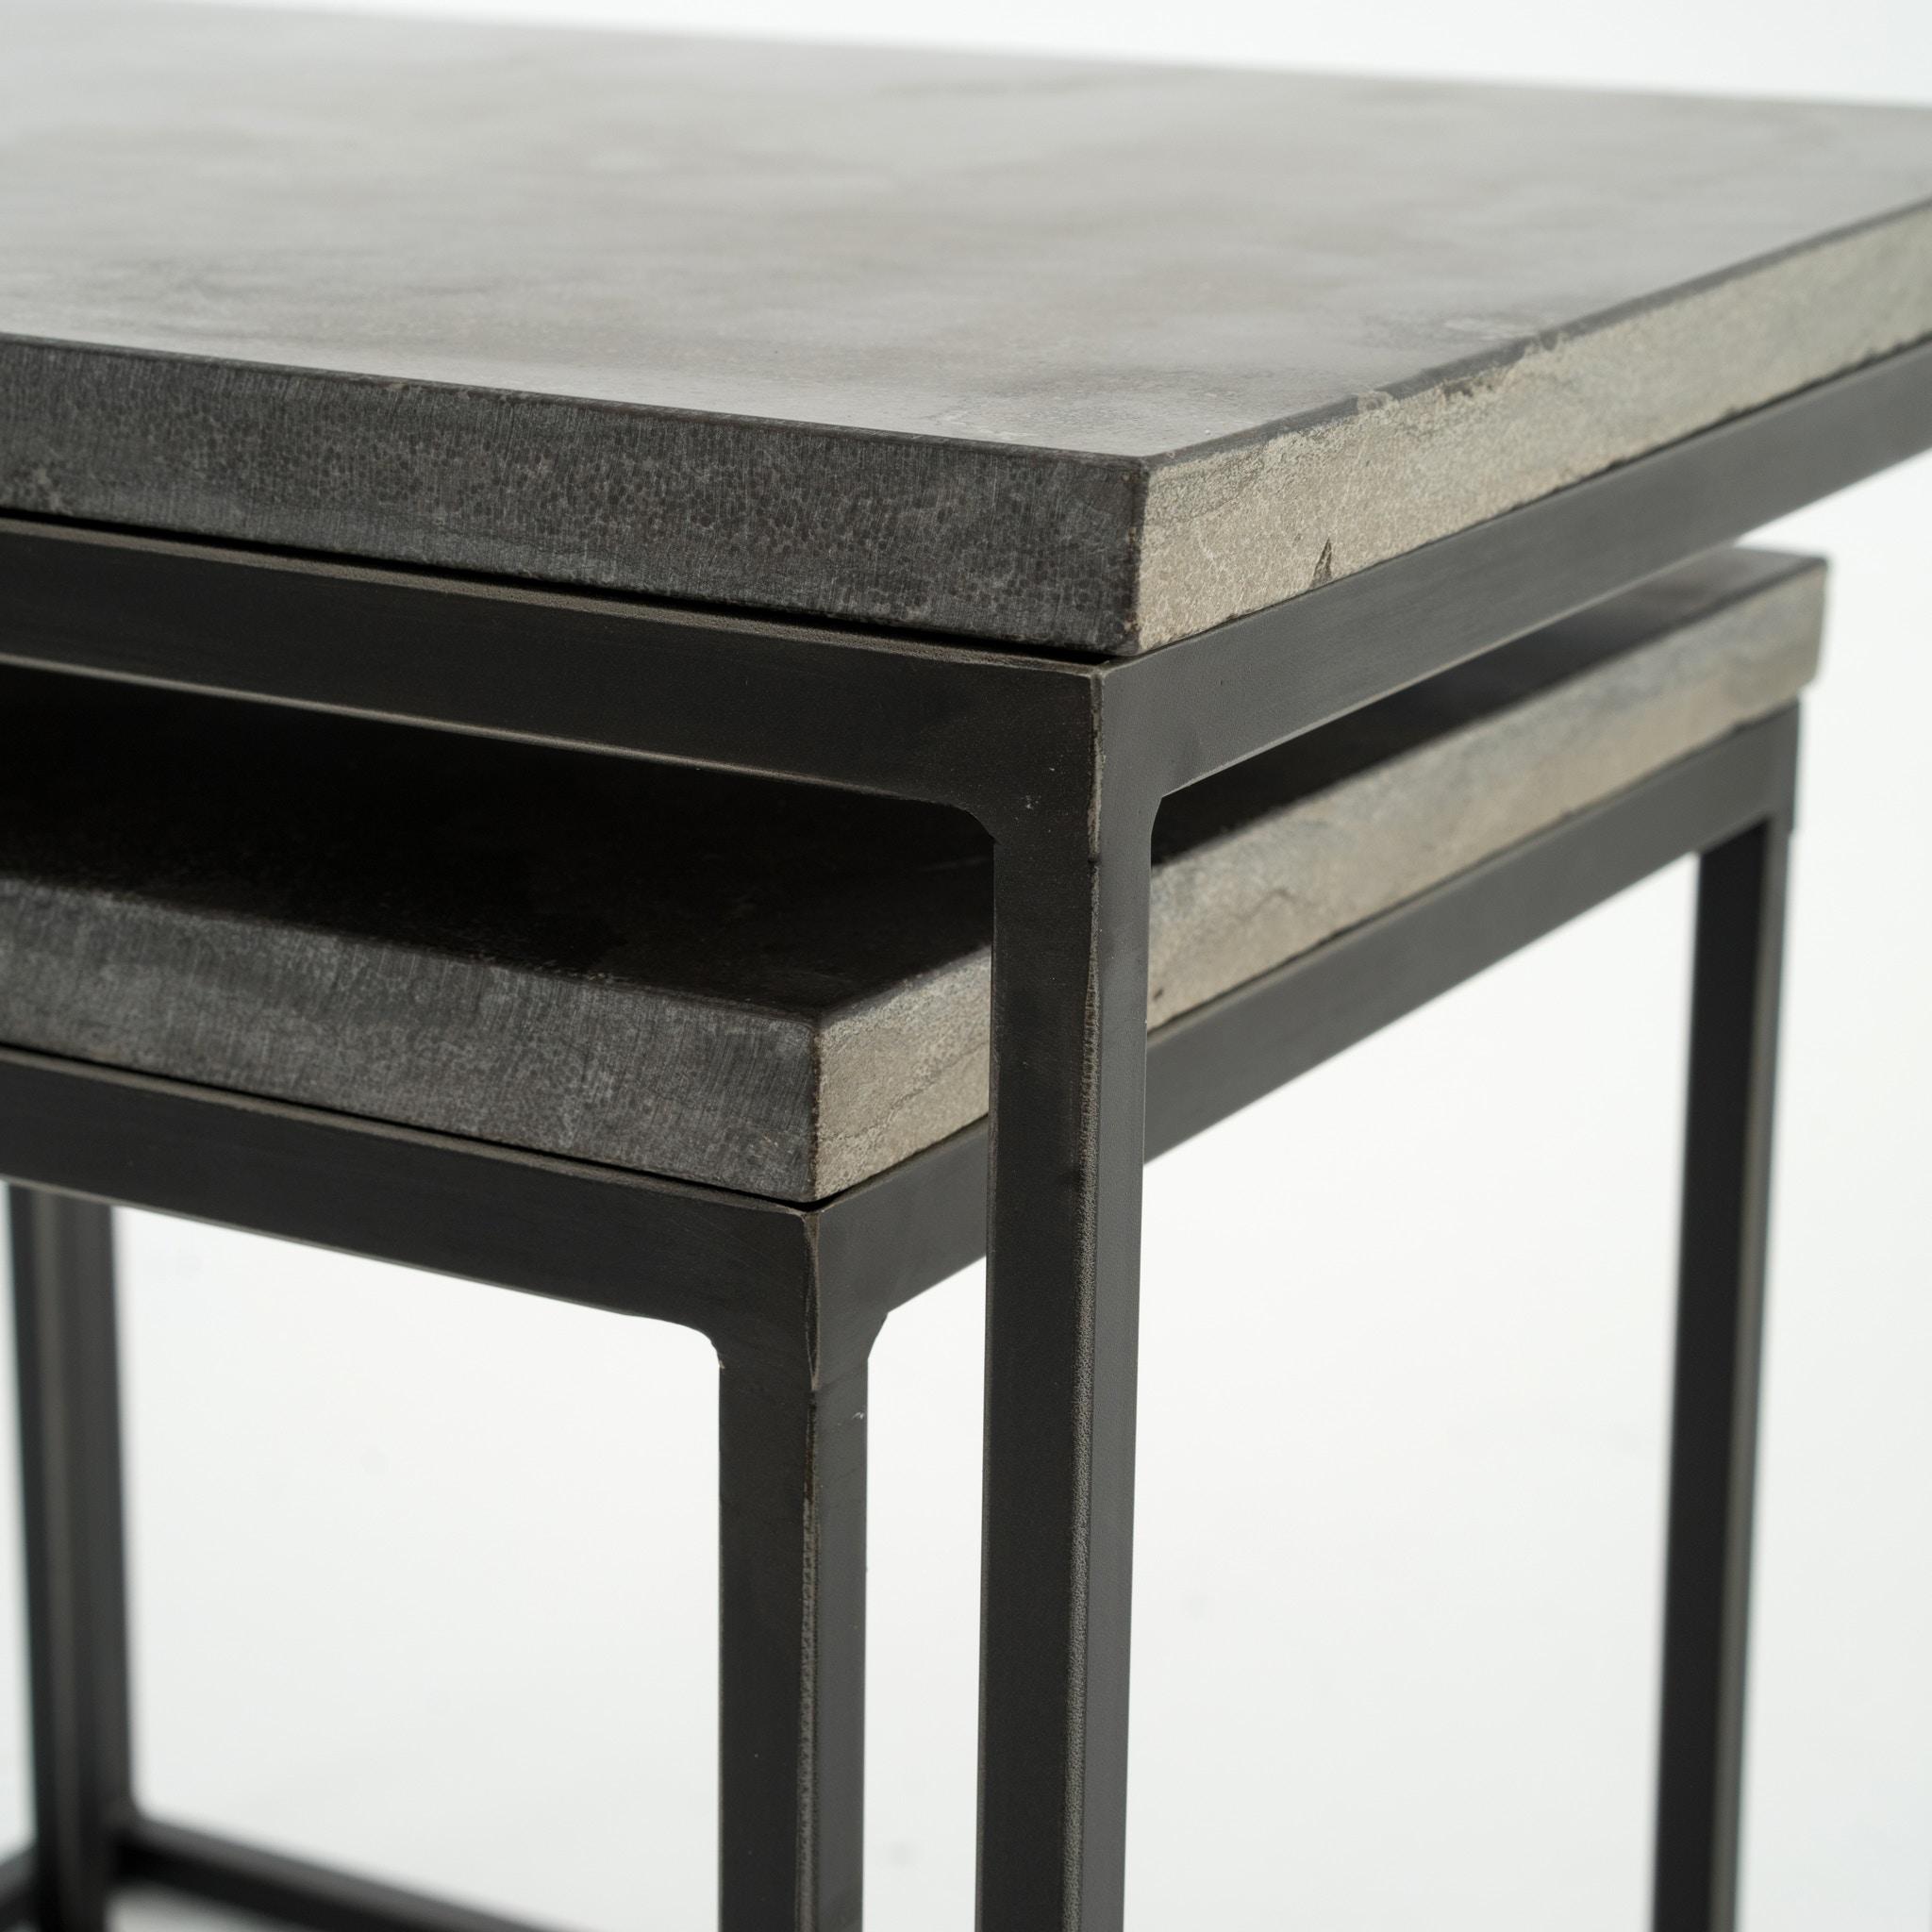 Four Hands Furniture Harlow Nesting End Tables CIMP 11L